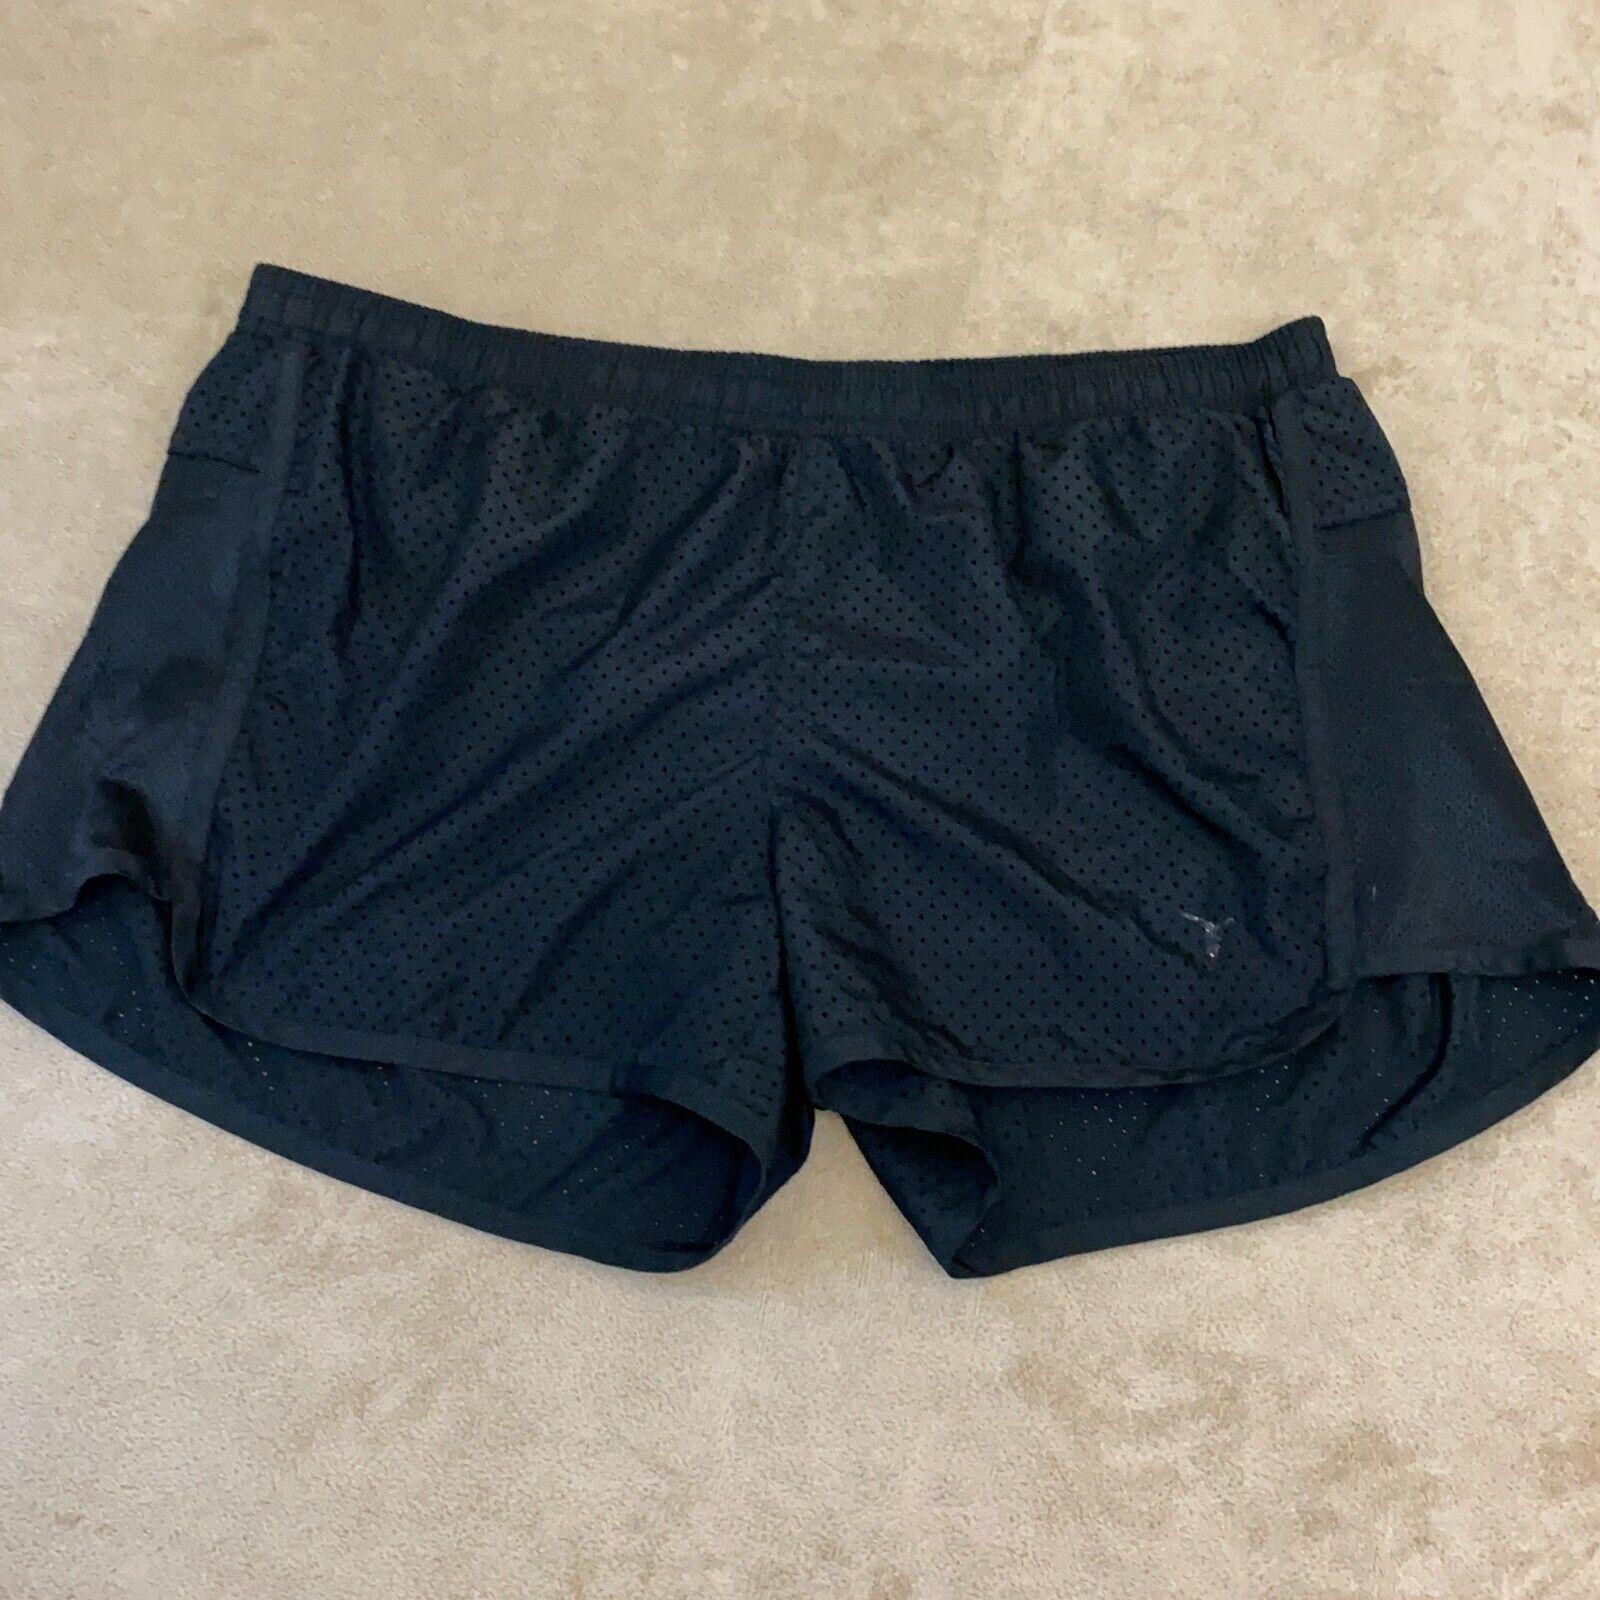 Old Navy Womens Black Elastic Waist Flat Front Athletic Shorts Size Medium